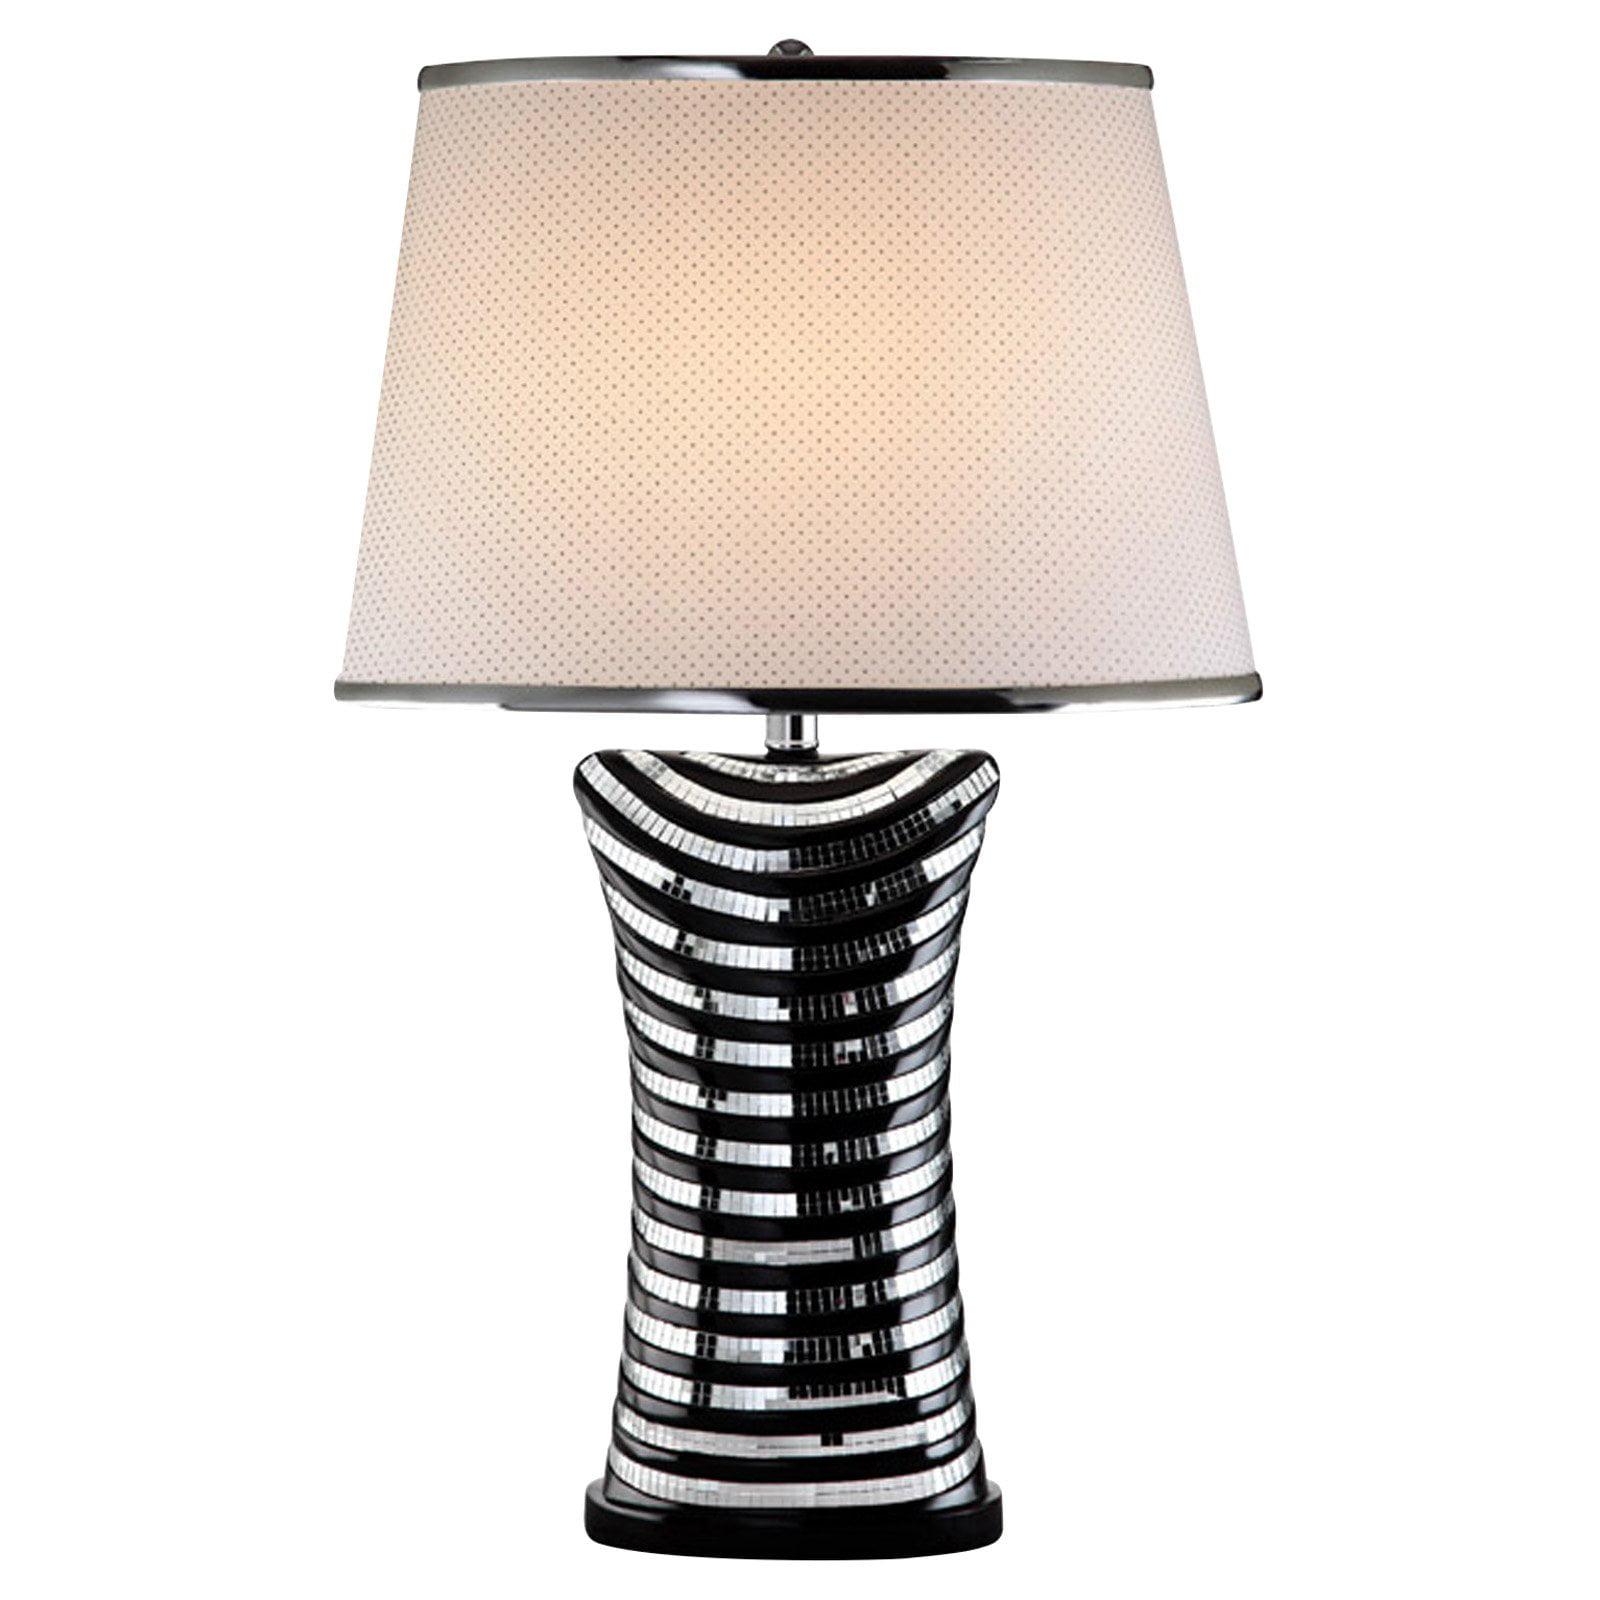 "Ore International 28"" Equiferus Table Lamp"